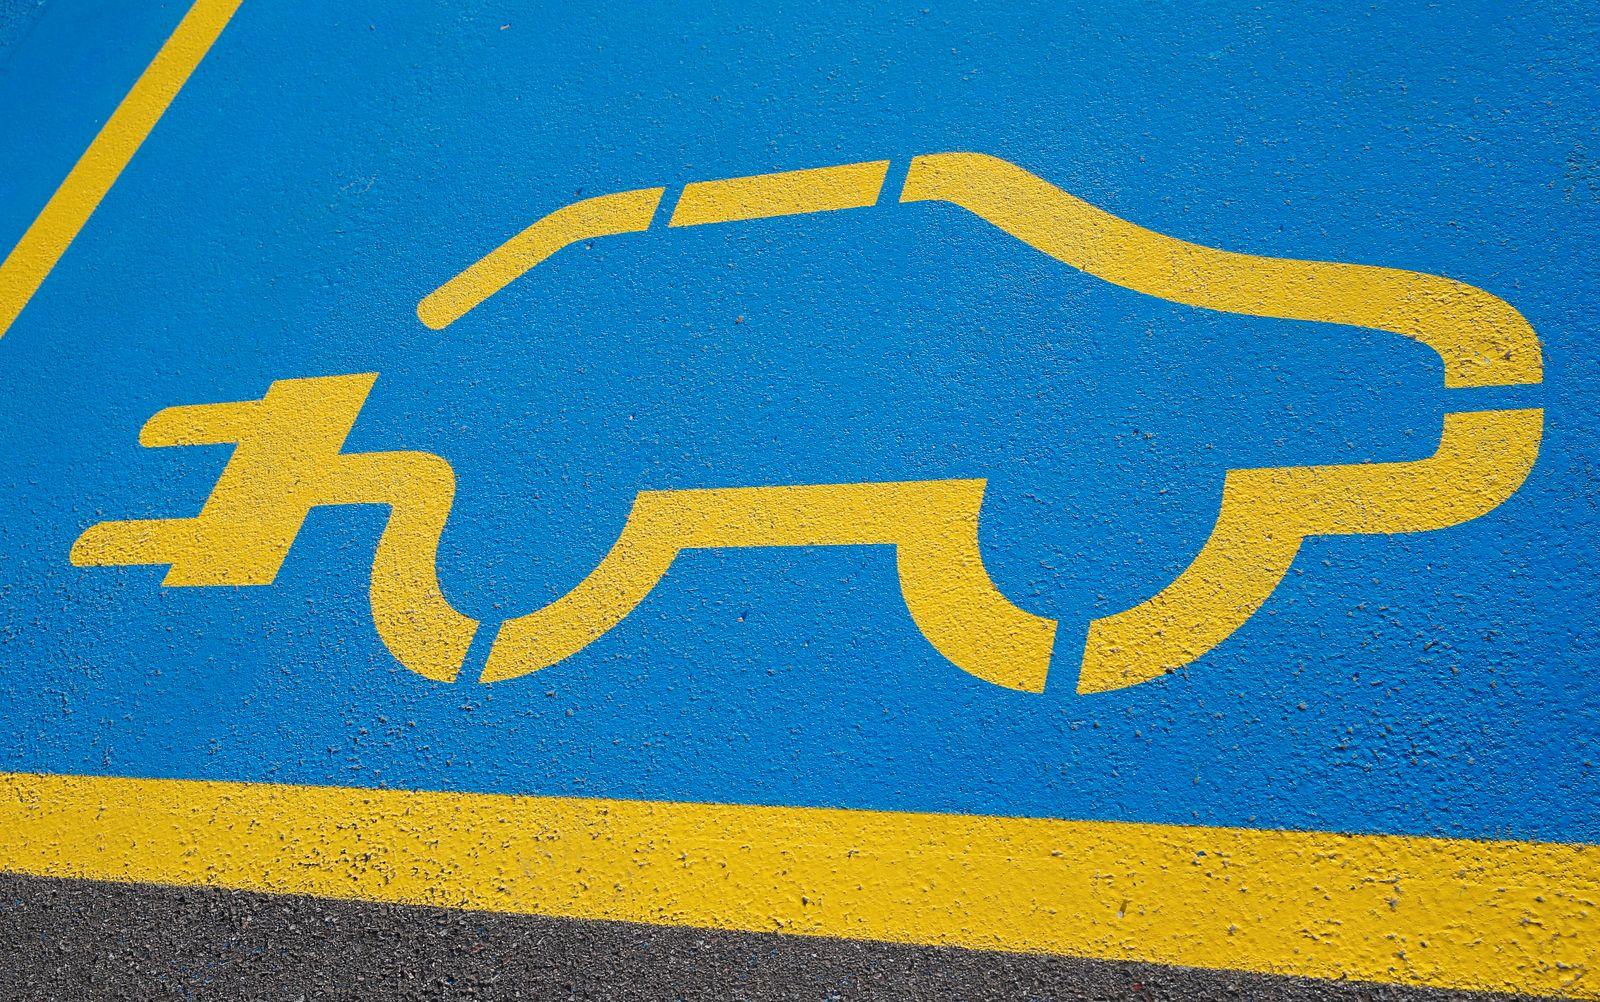 Foto Manuel Geisser 18.6.2020 : Ladestation f¸r Elektroautos *** Photo Manuel Geisser 18 6 2020 Charging station for ele